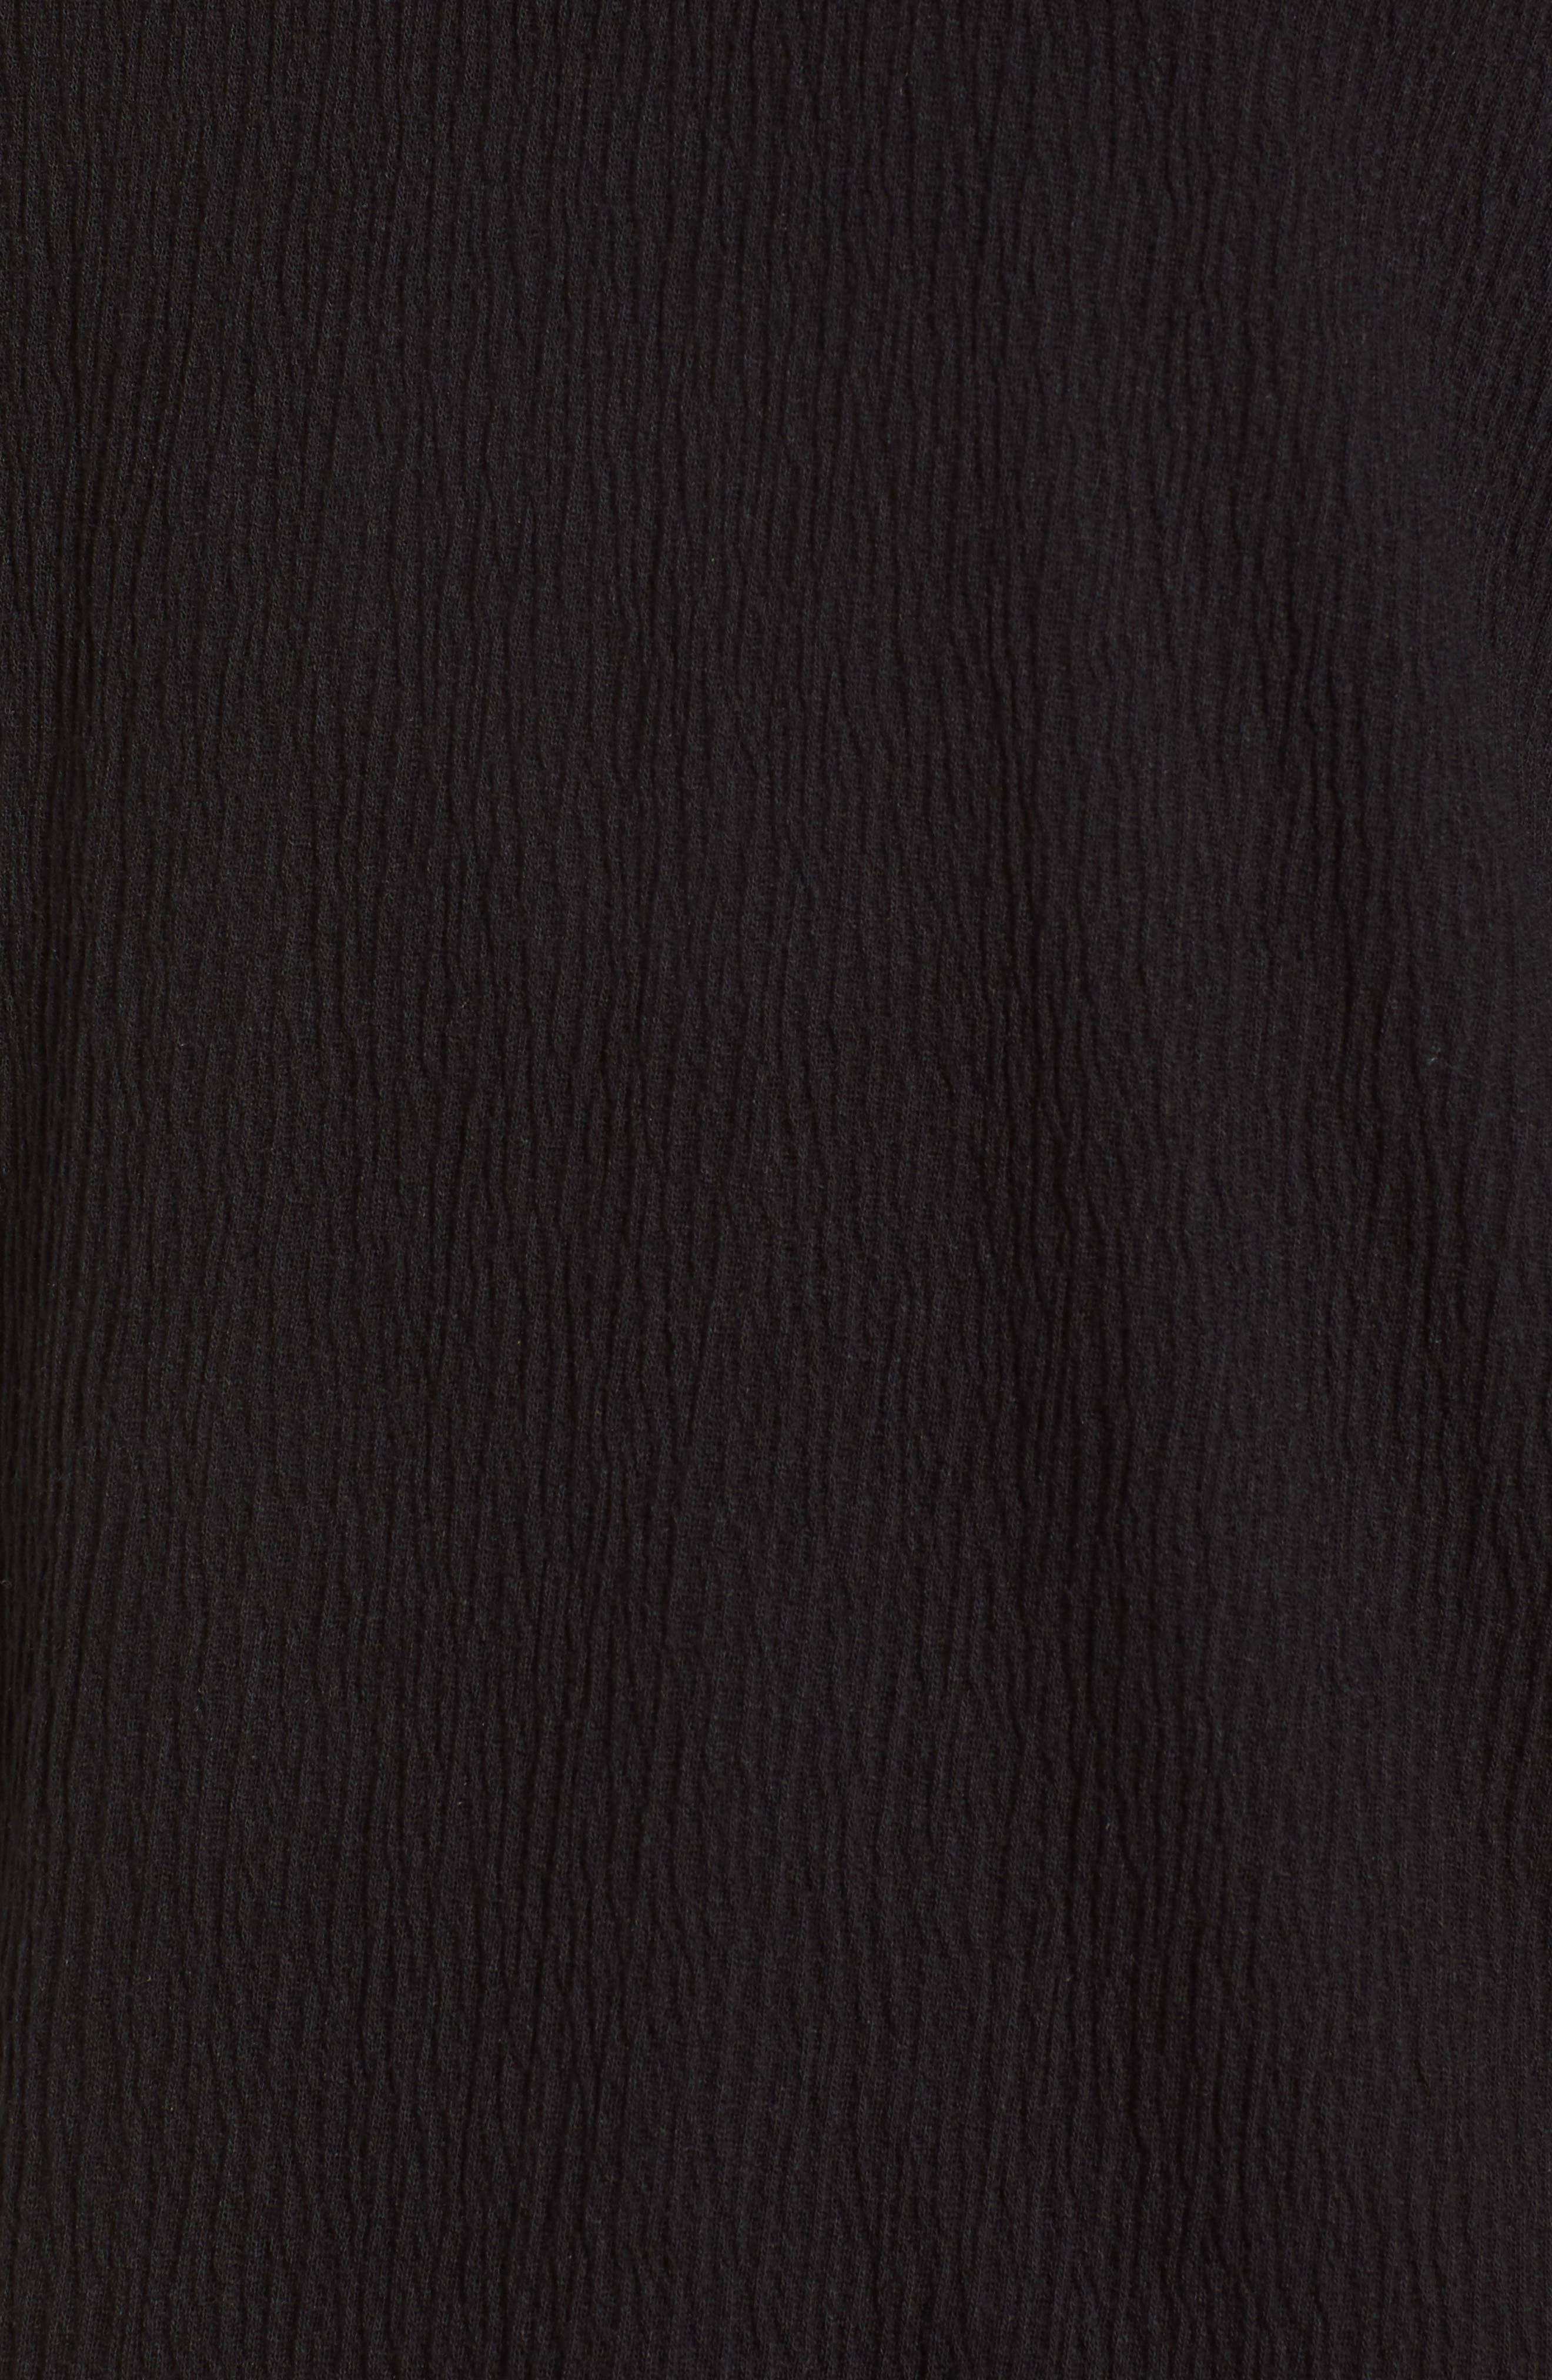 Ruffle Sleeve Top,                             Alternate thumbnail 6, color,                             001